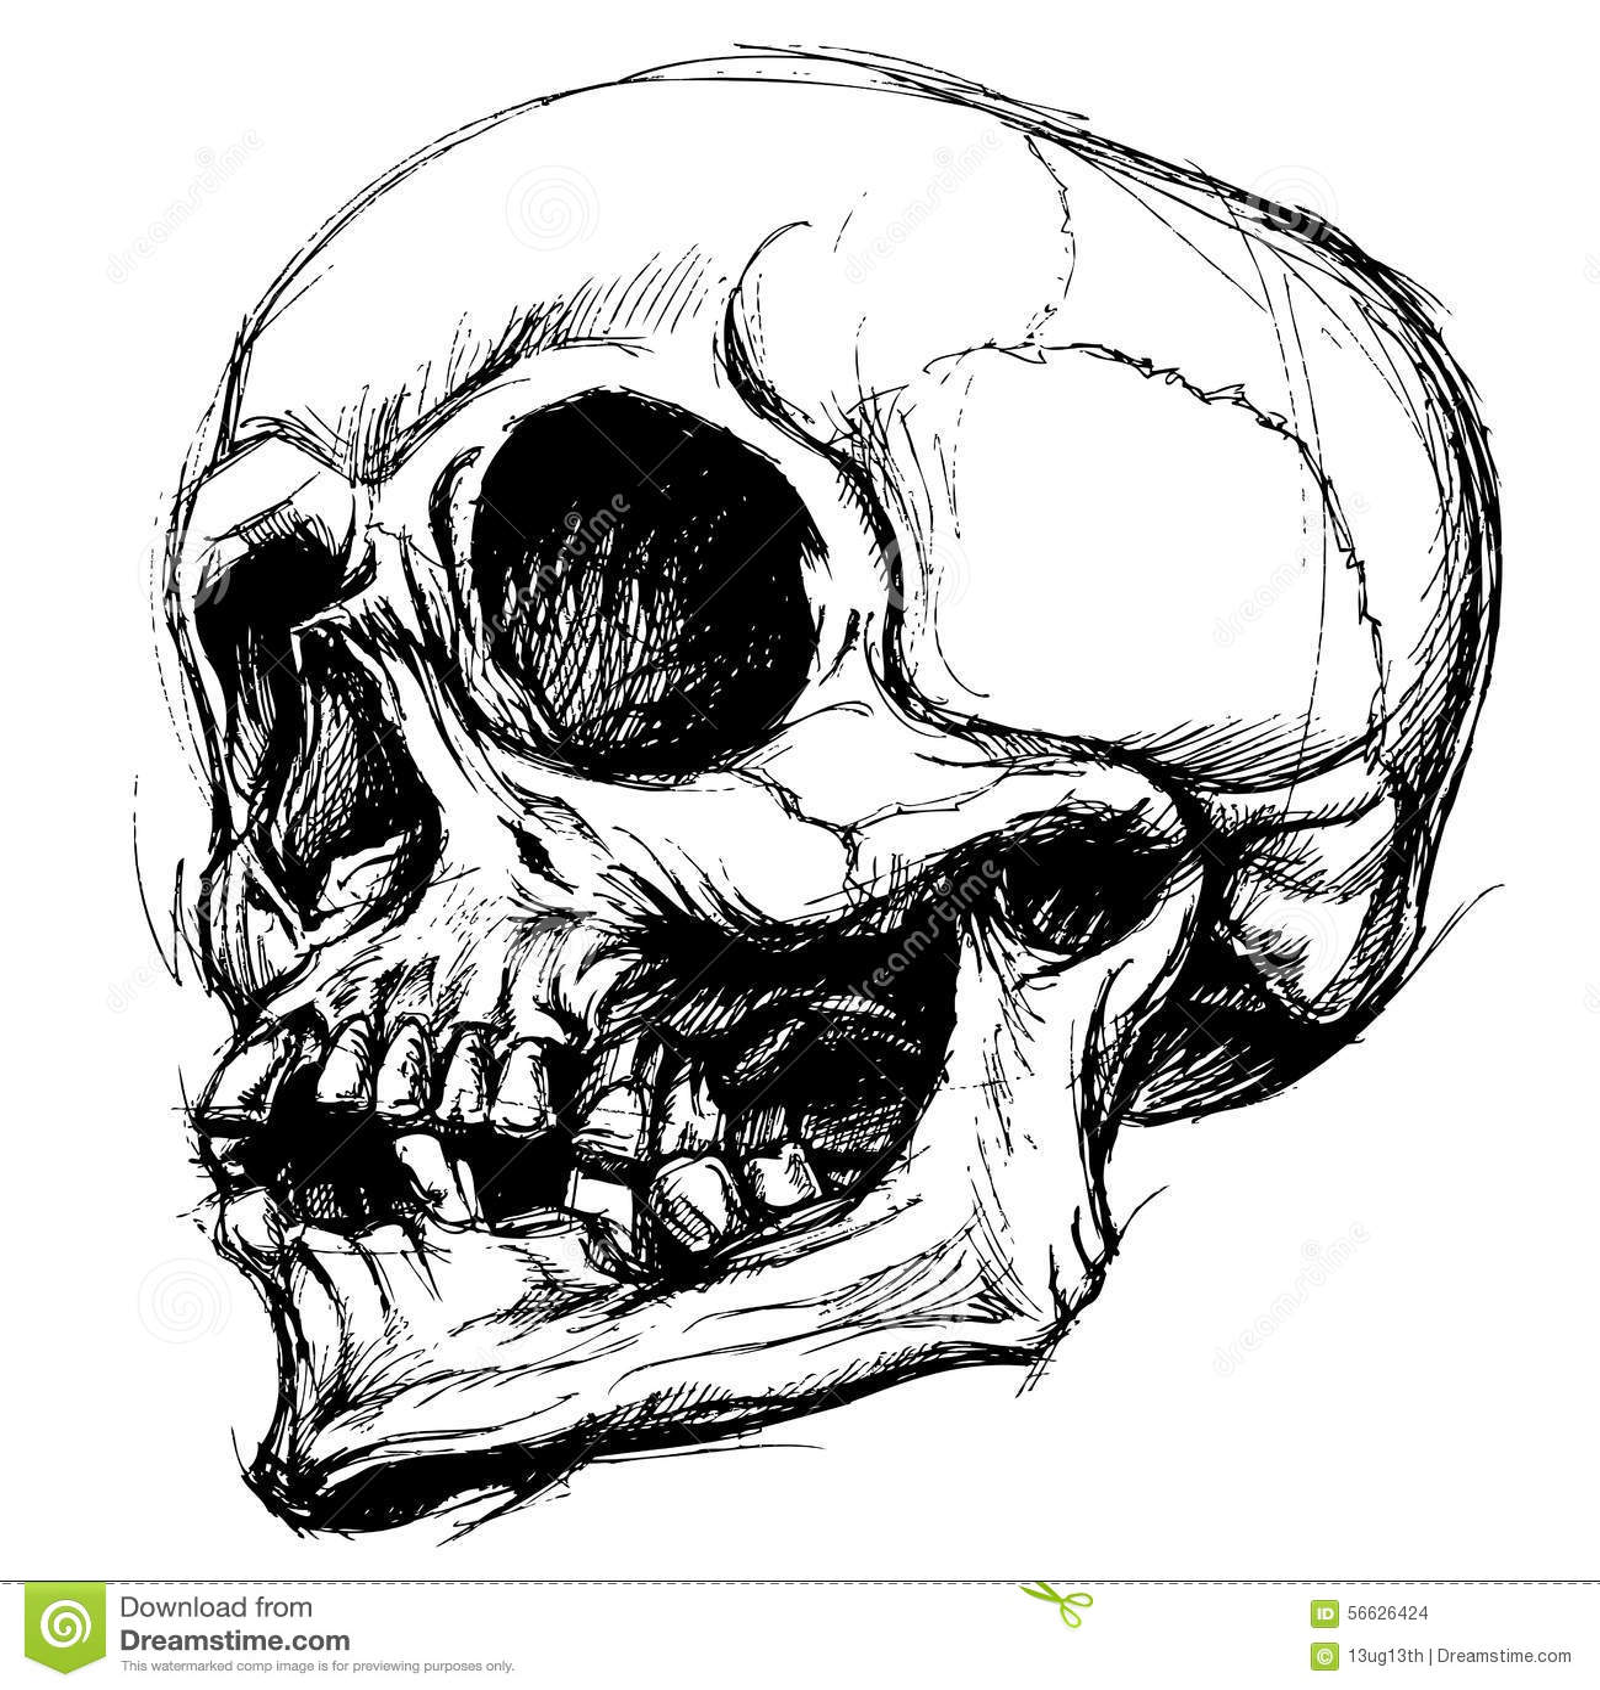 Line Drawing Skull : Skull drawing line work vector stock image